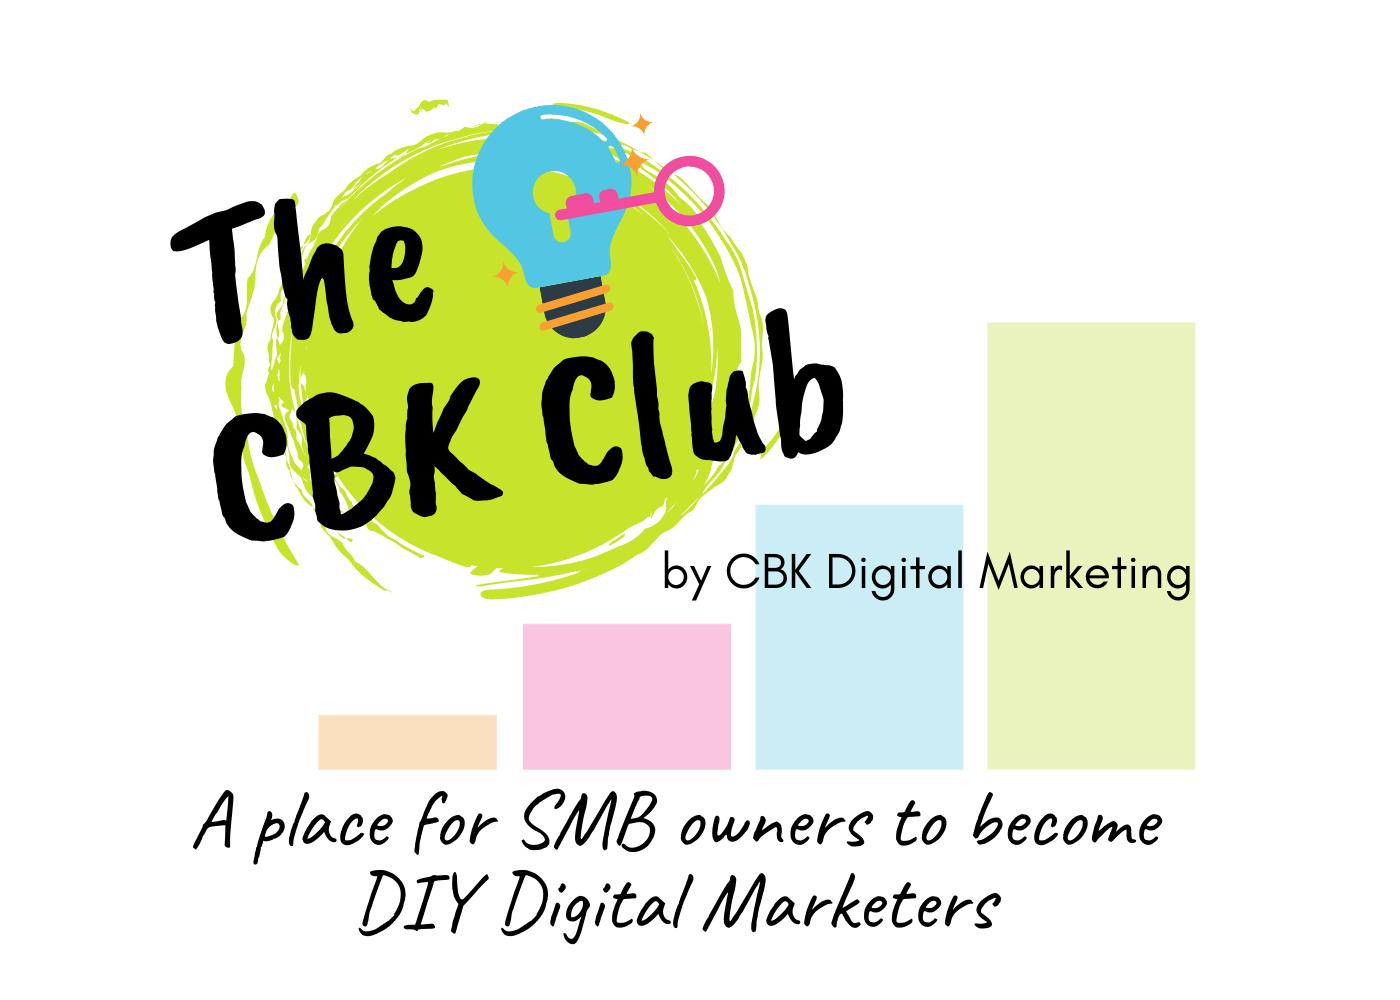 The CBK Club